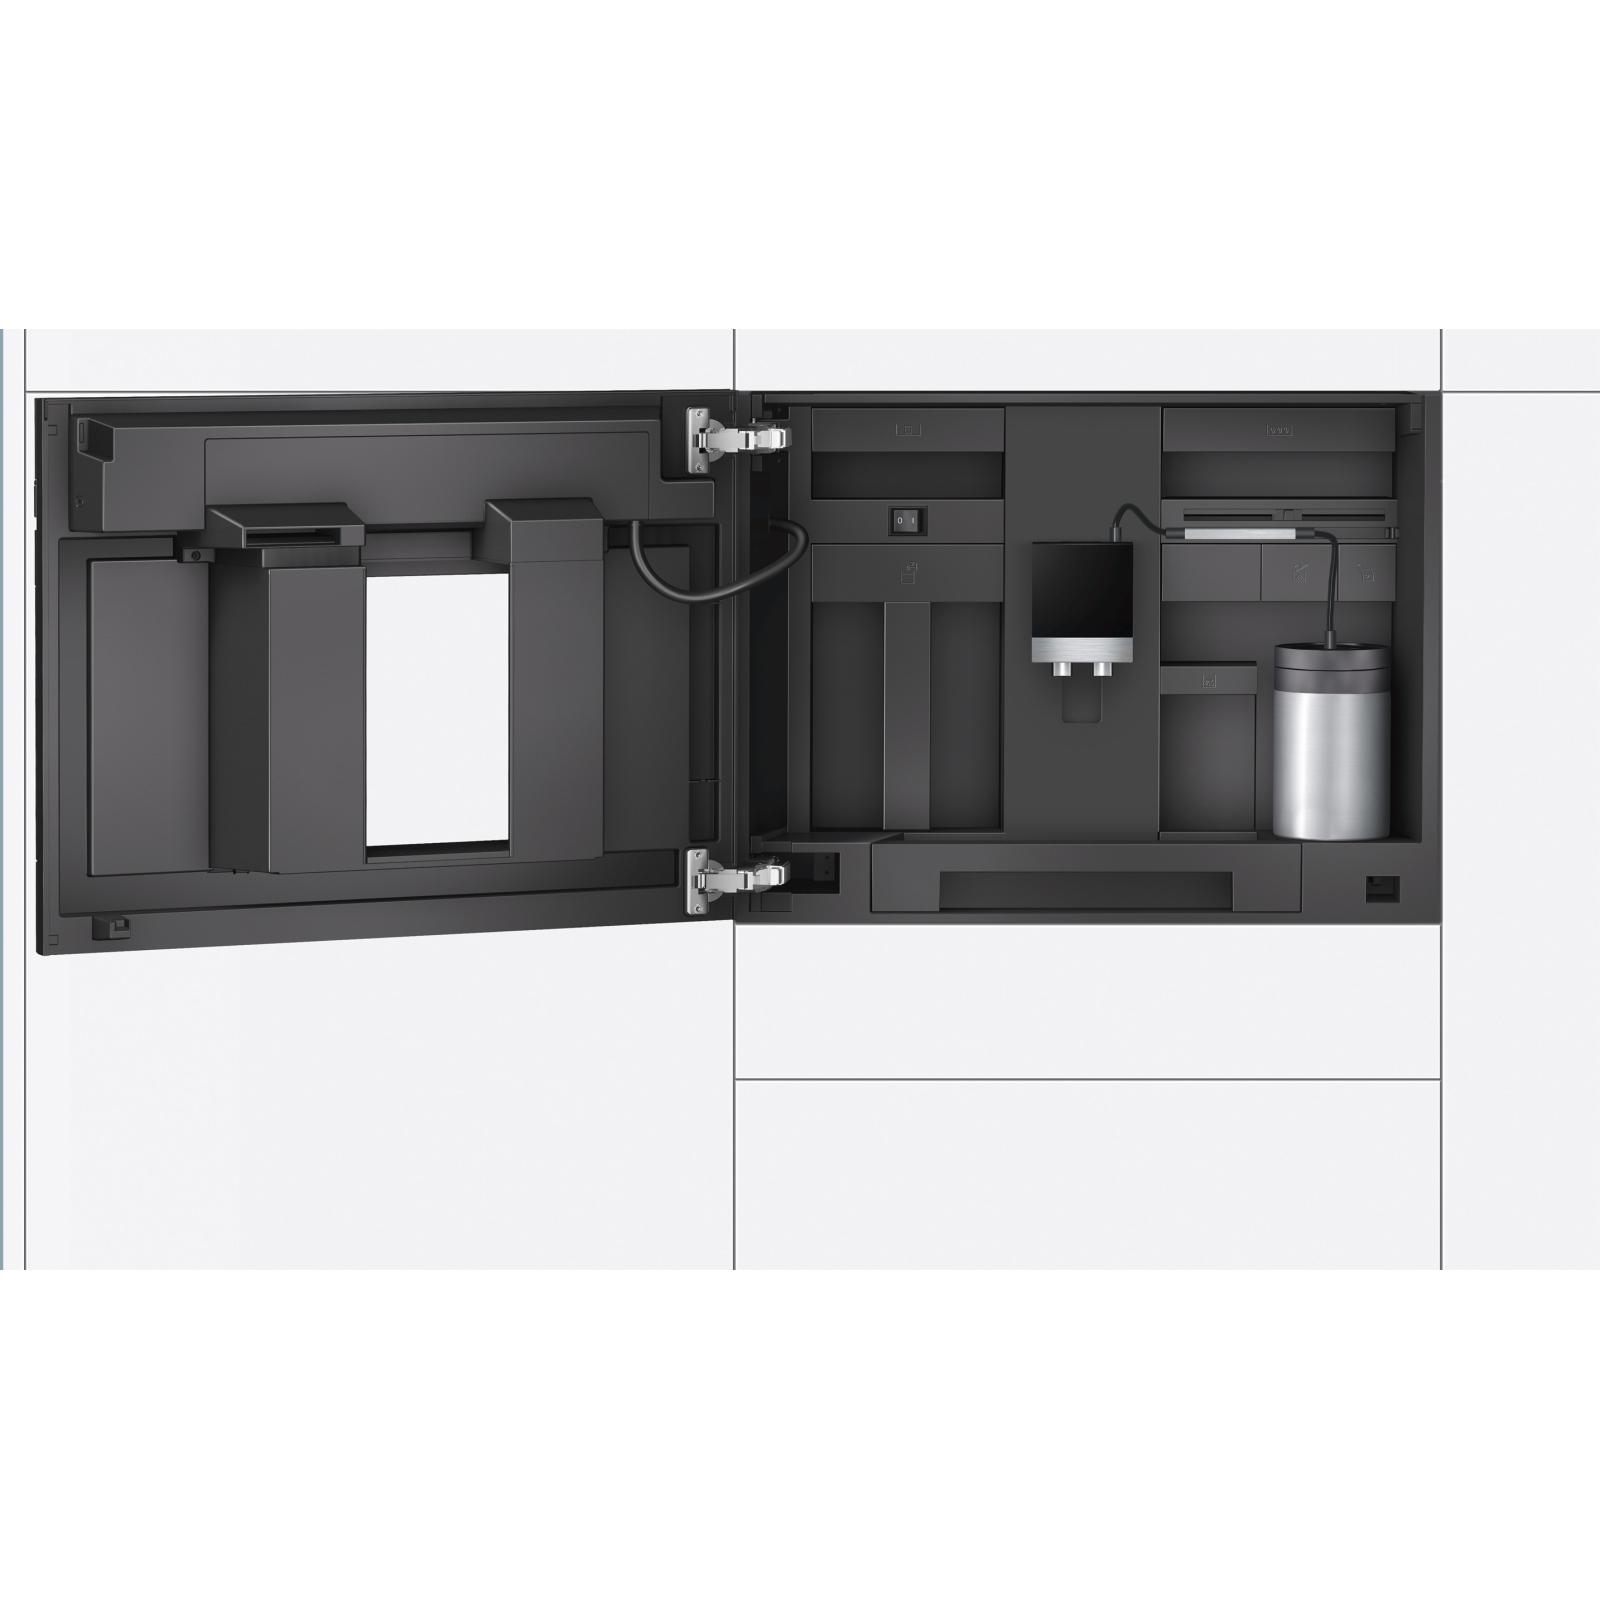 Кофеварка Siemens CT 636 LES1 (CT636LES1) изображение 3